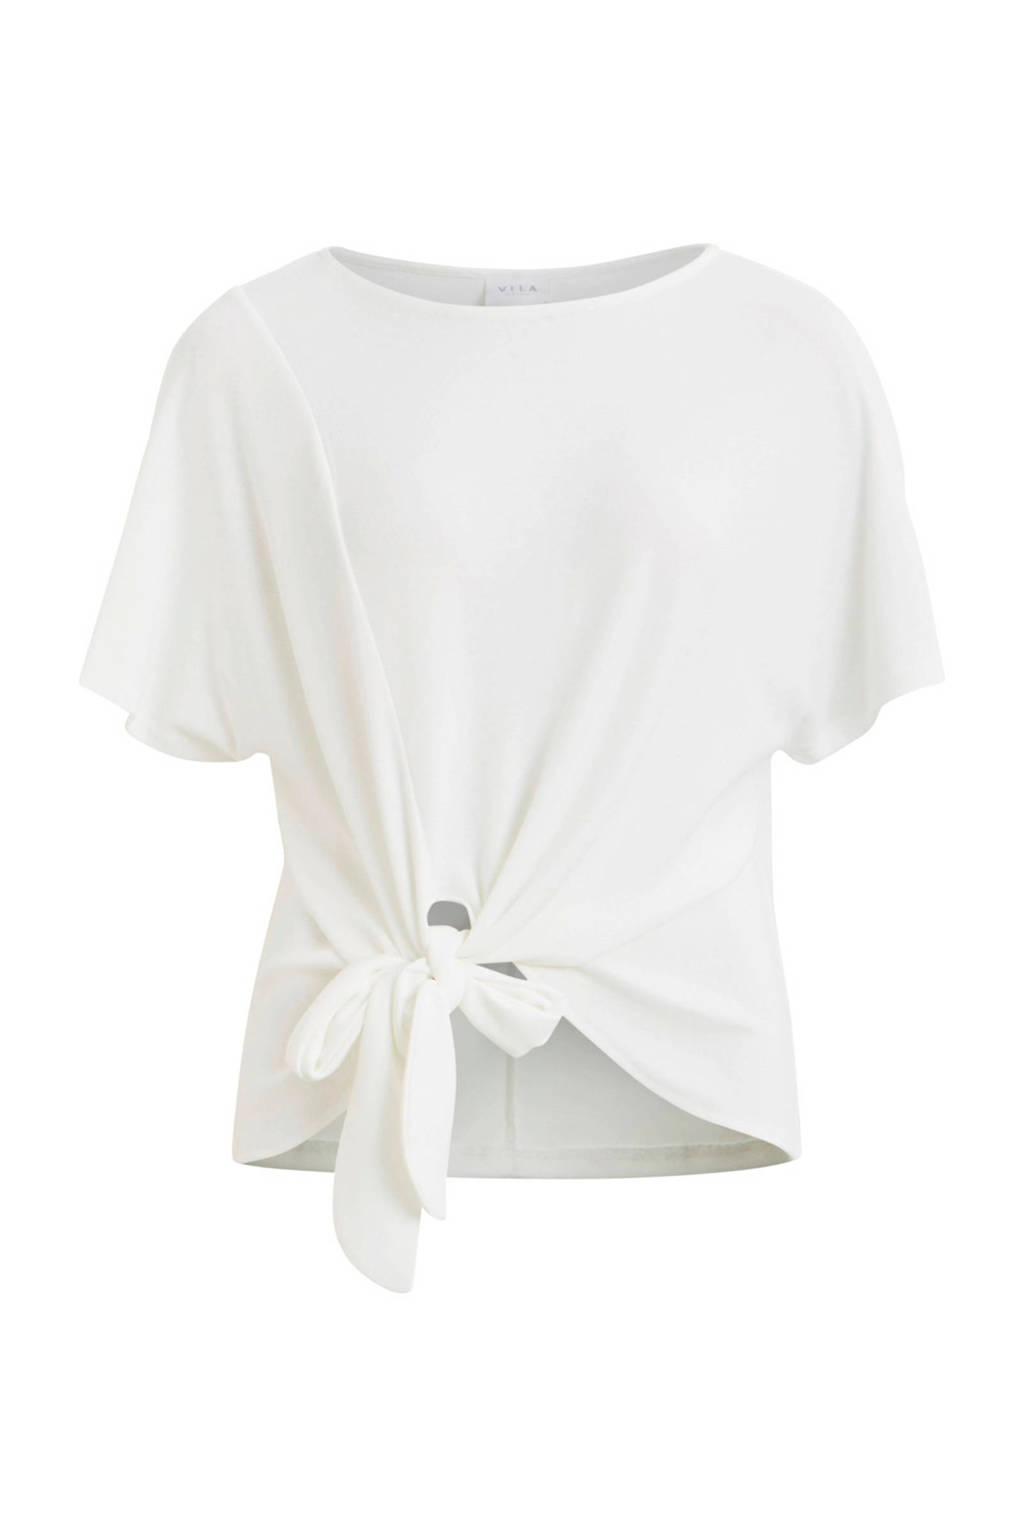 VILA top met strikdetail wit, Wit